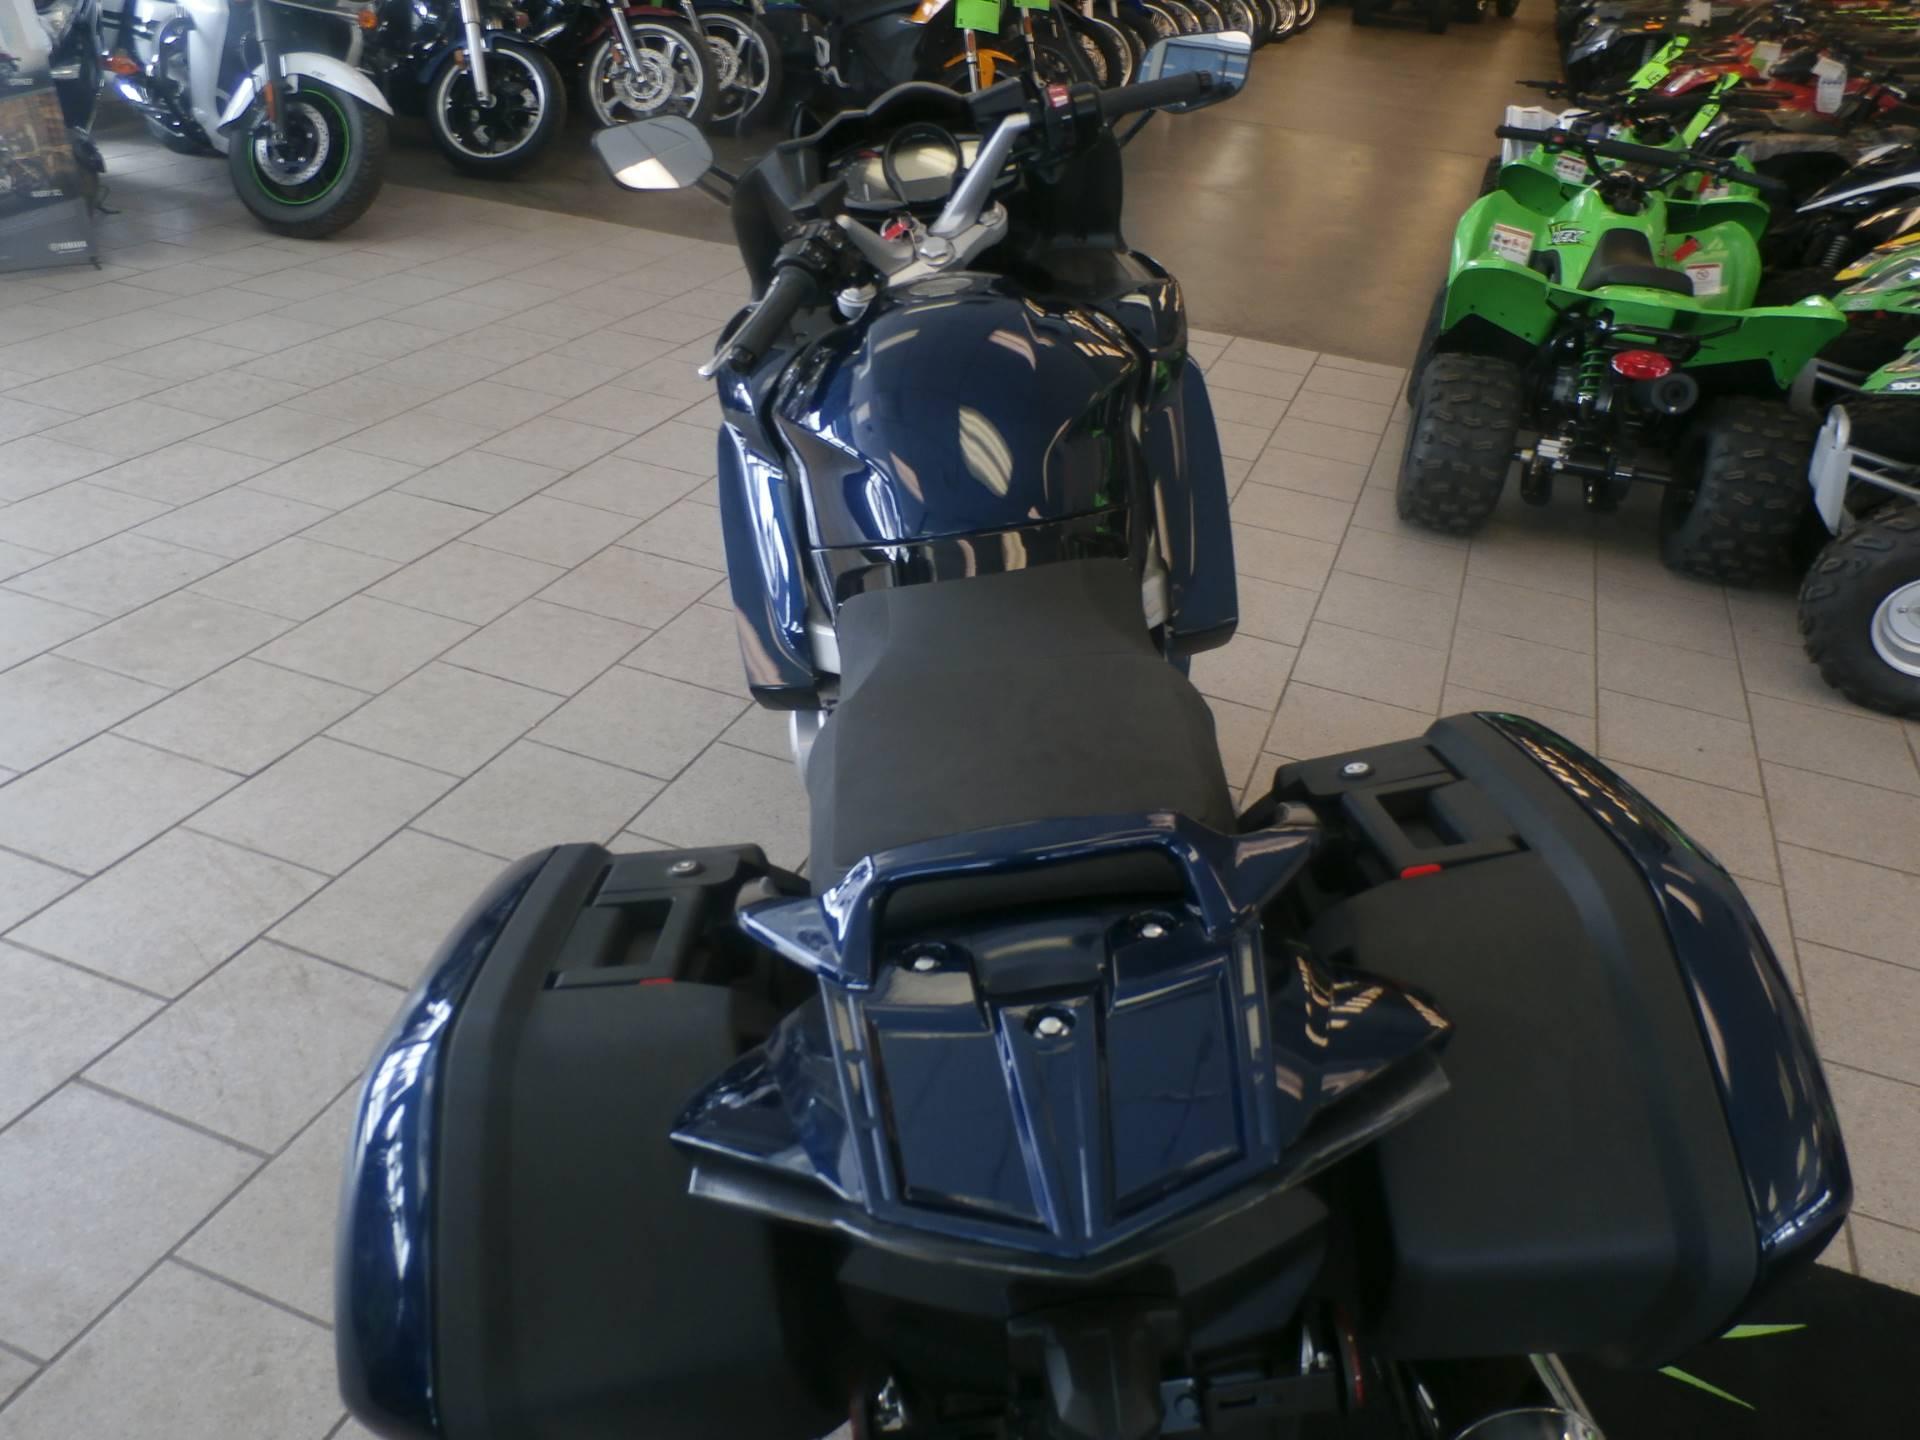 2016 Yamaha FJR1300A 5